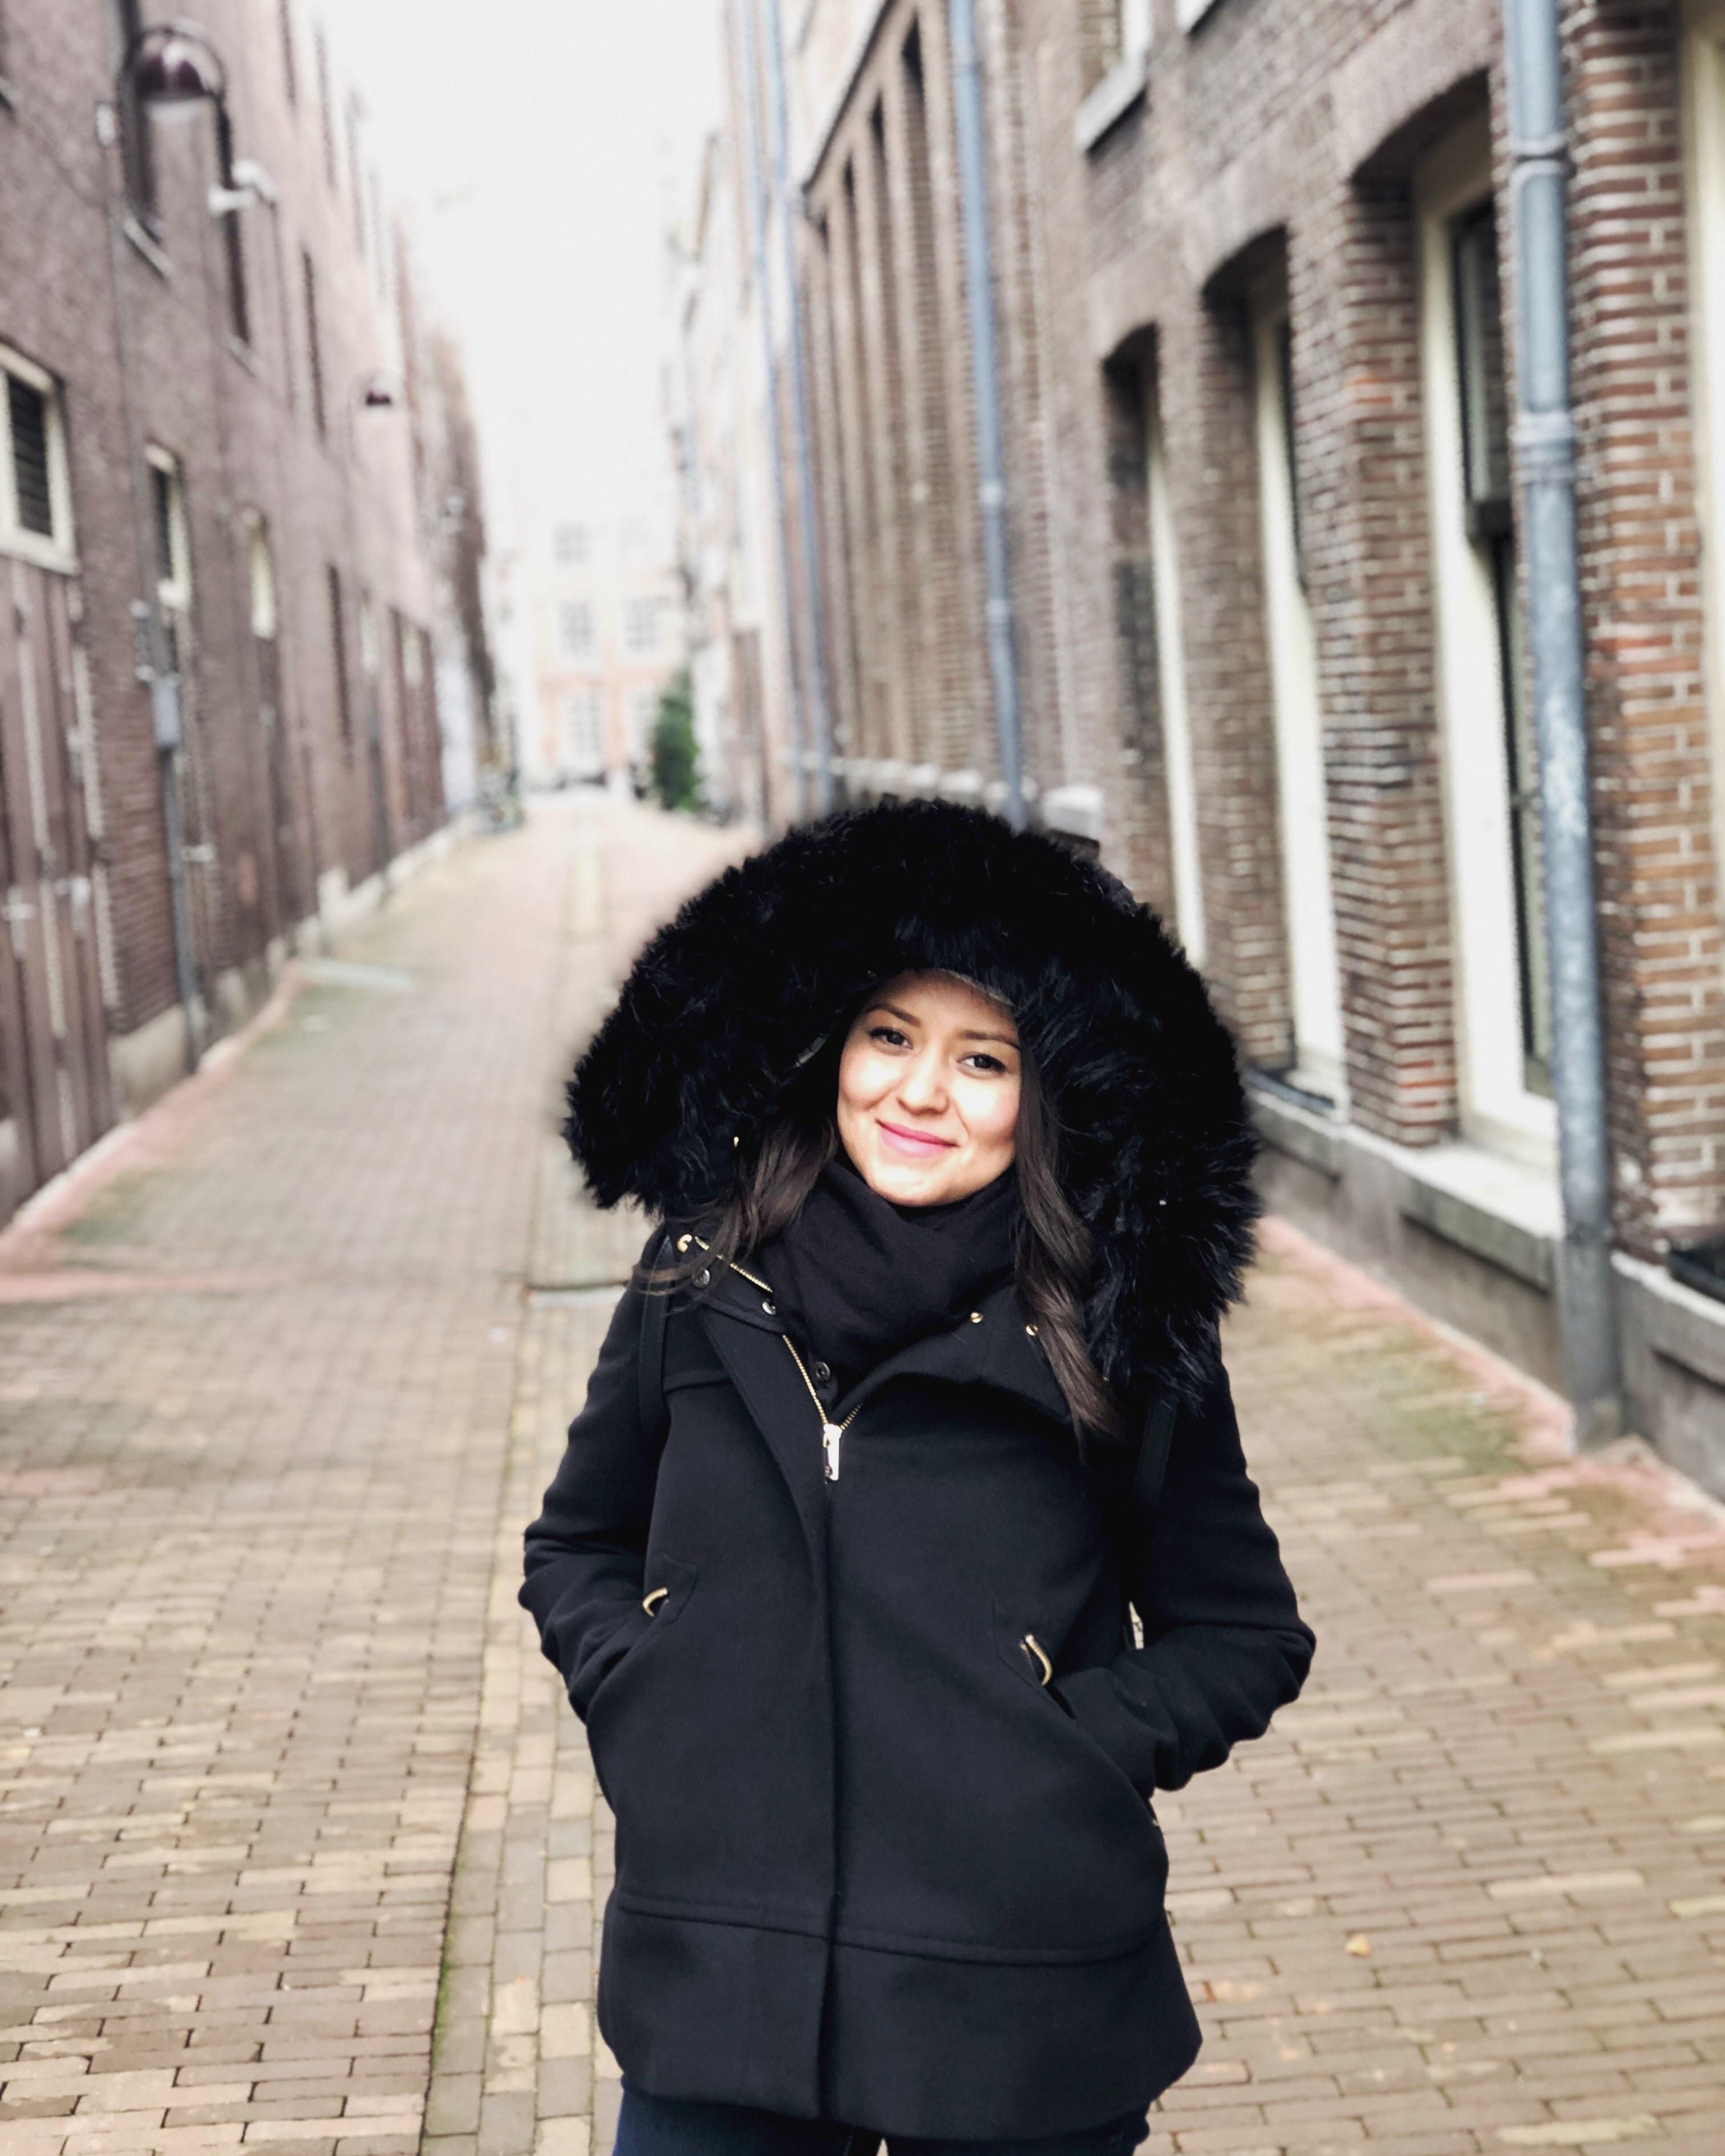 Go to Diana Garcia's profile